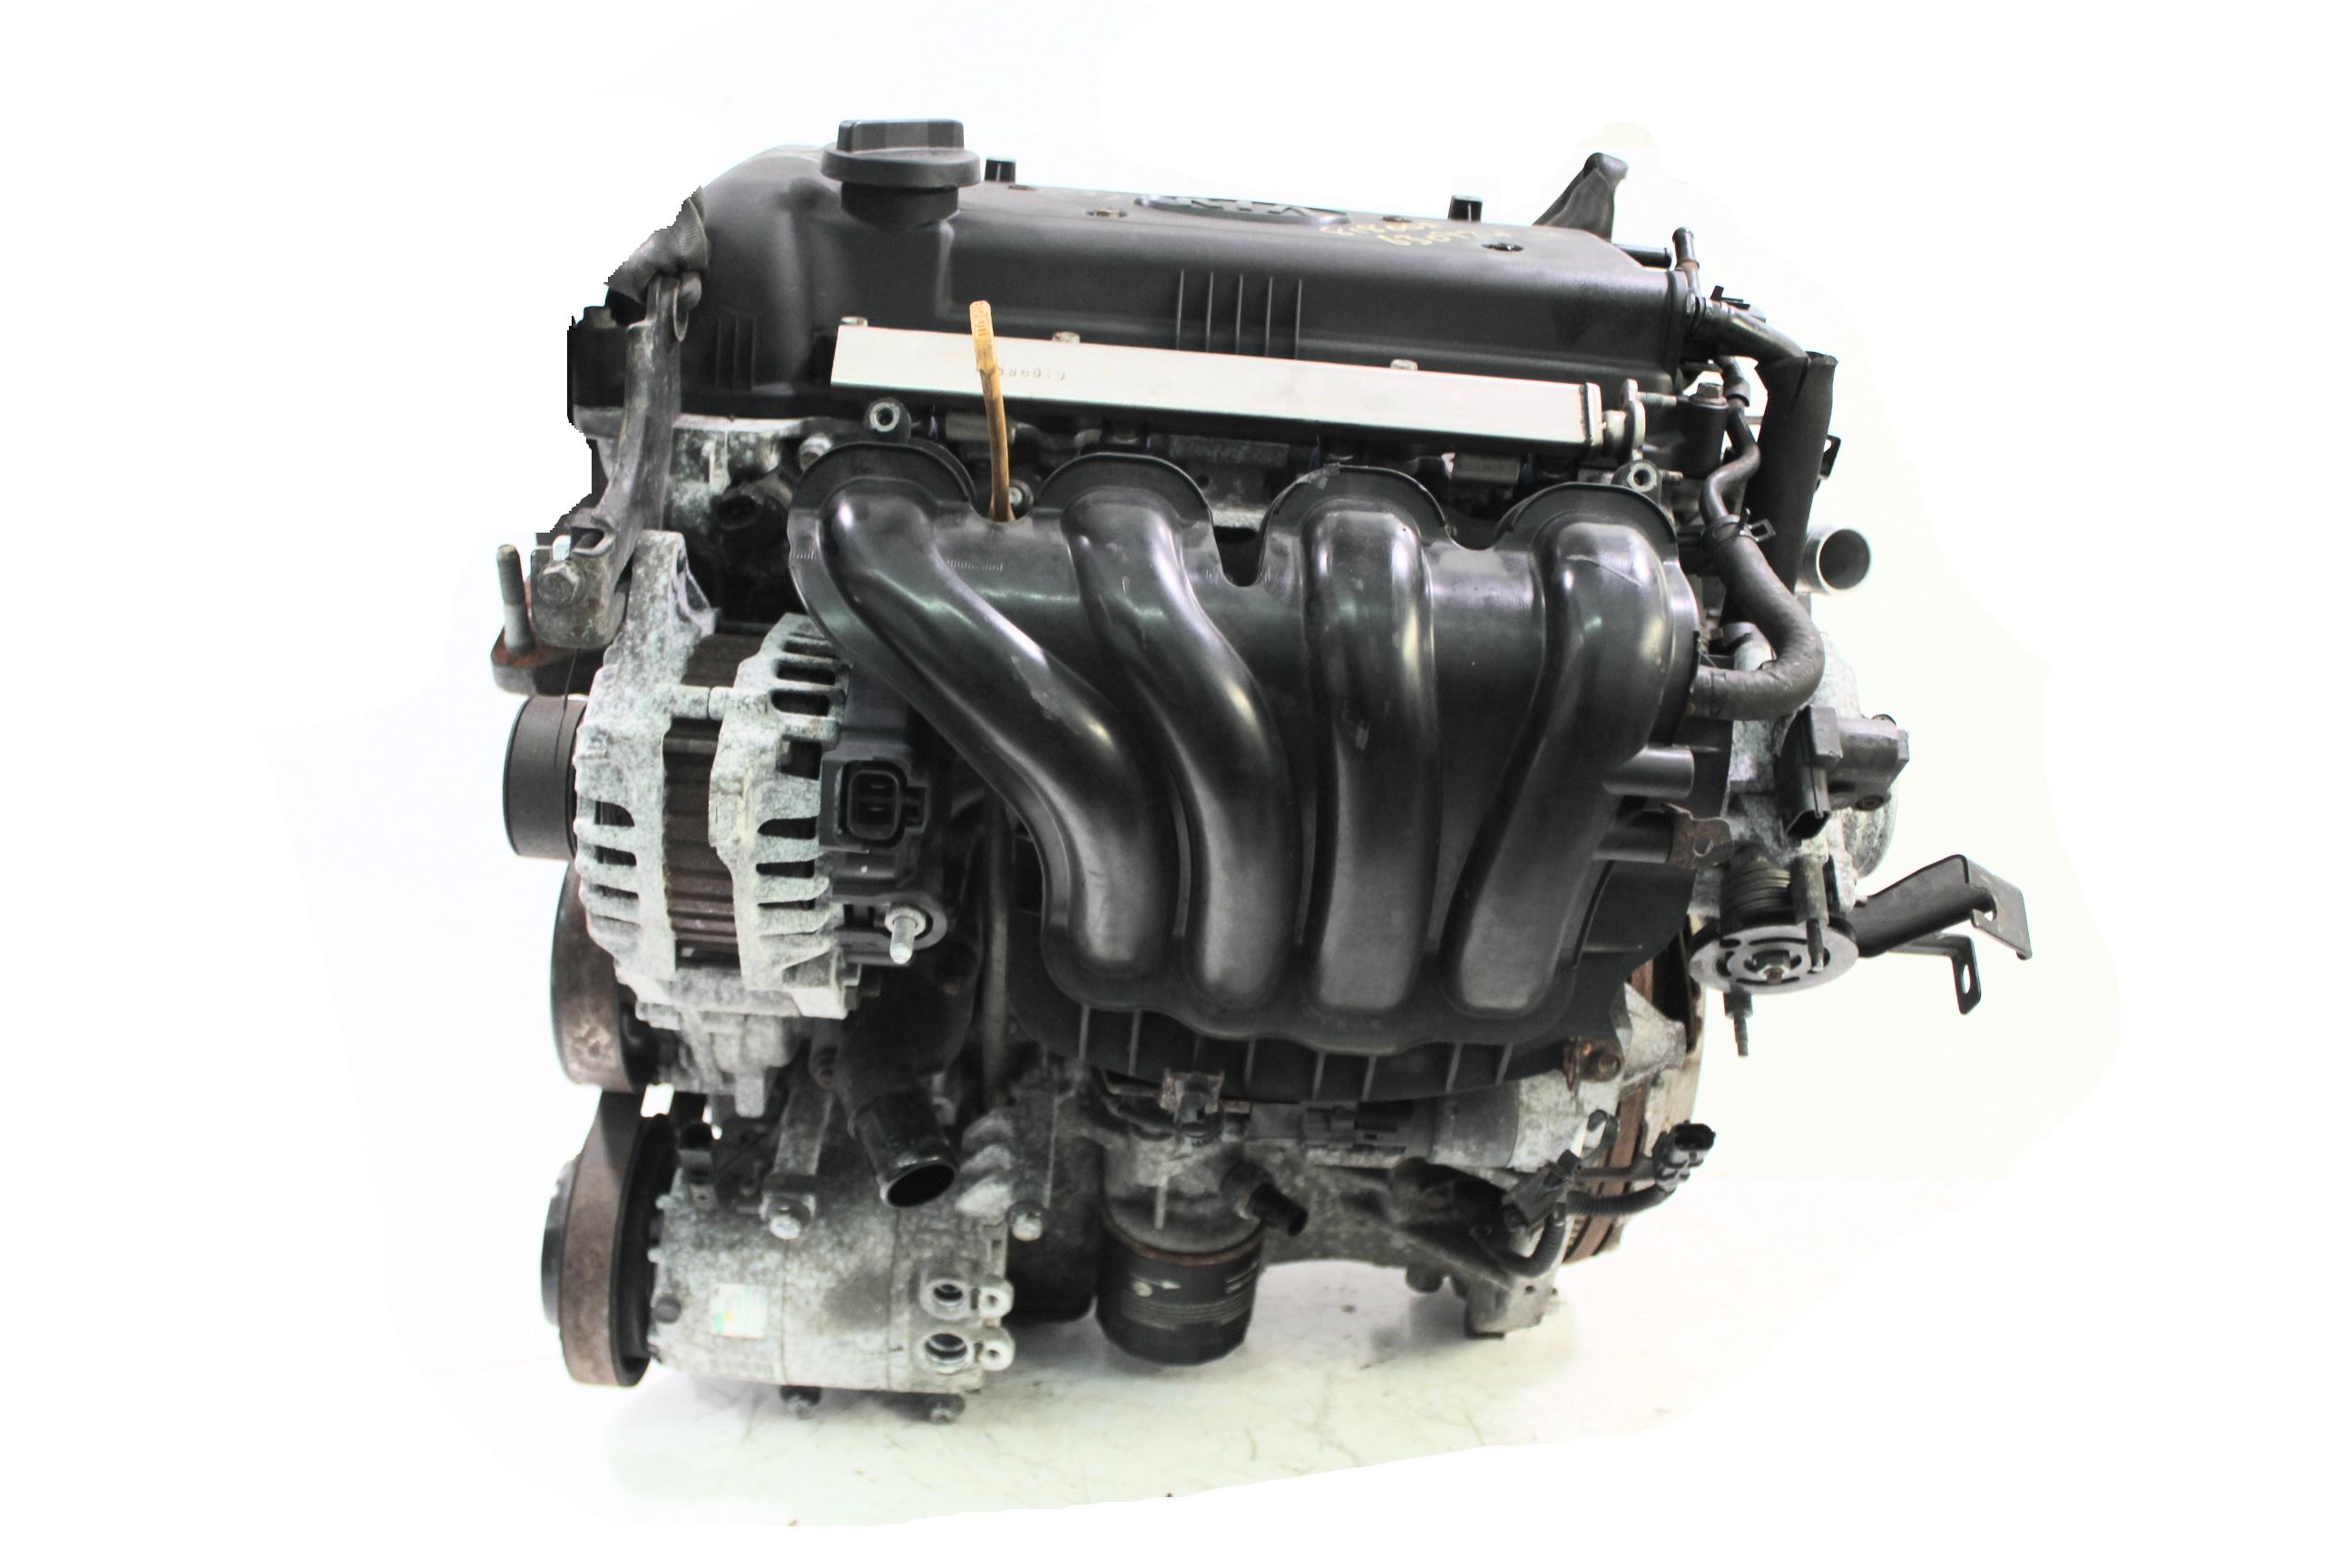 Motor 2010 Kia Soul AM 1,6 CVVT Benzin G4FC mit Anbauteilen